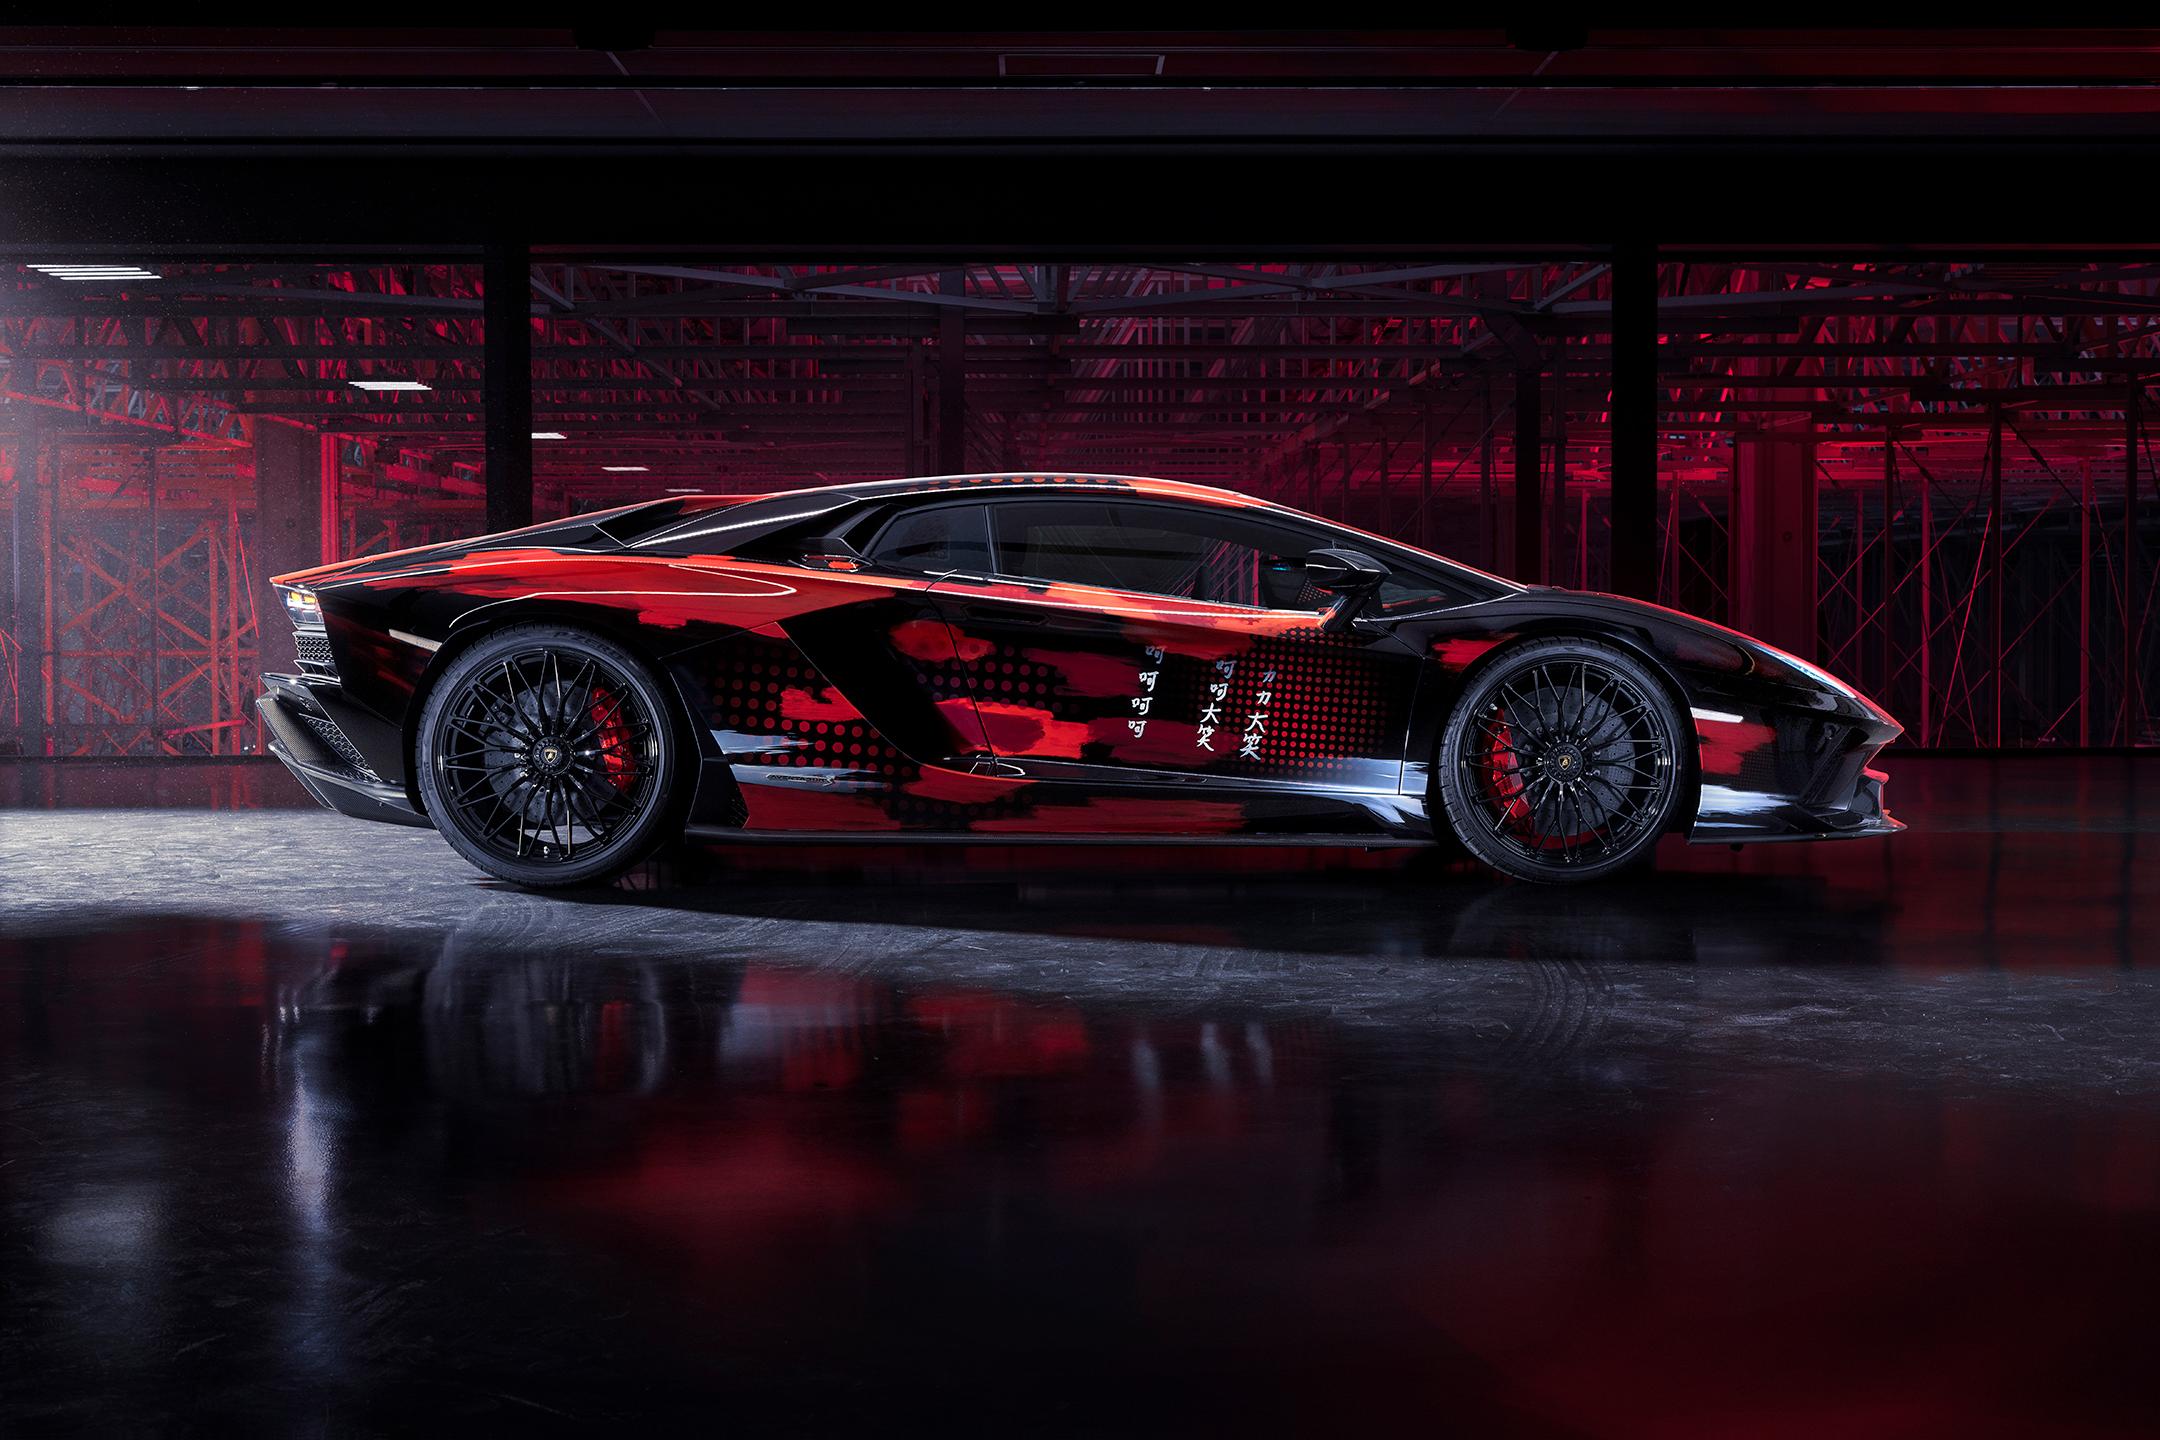 Lamborghini Aventador S x Yohji Yamamoto fashion designer - 2020 - side-face / profil